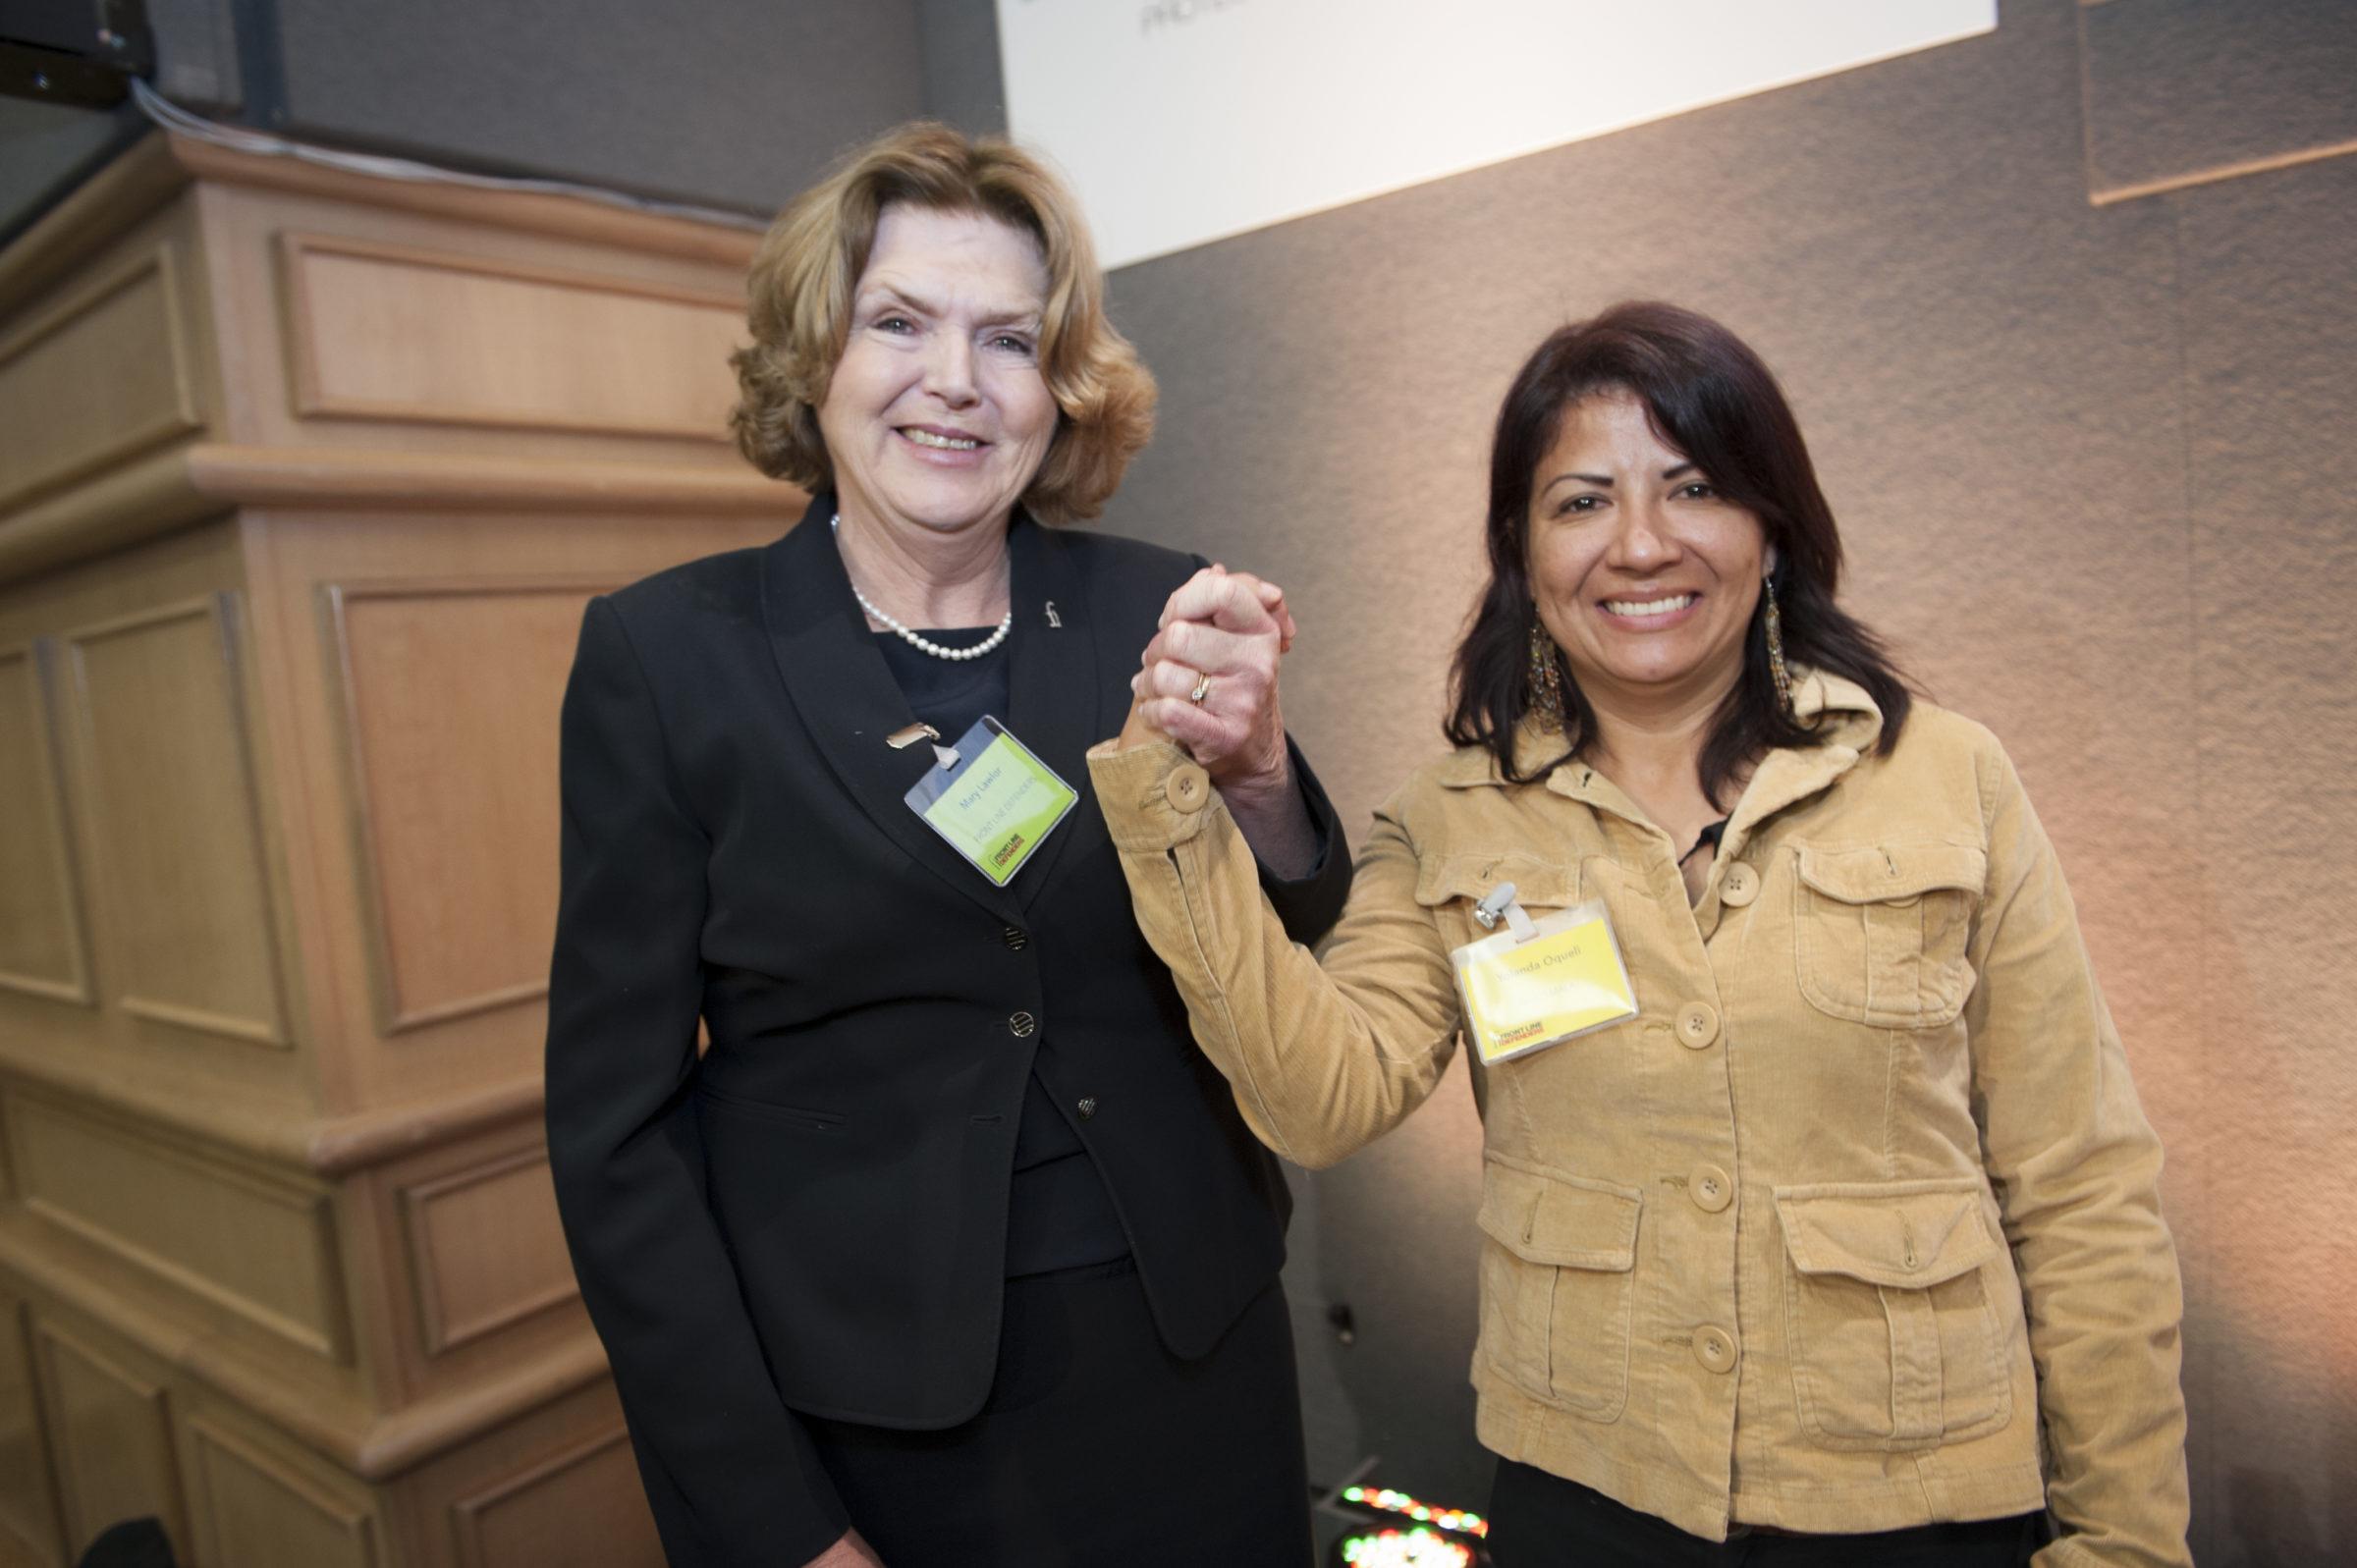 Mary and Guatemalan woman human rights defender Yolanda Oquelí